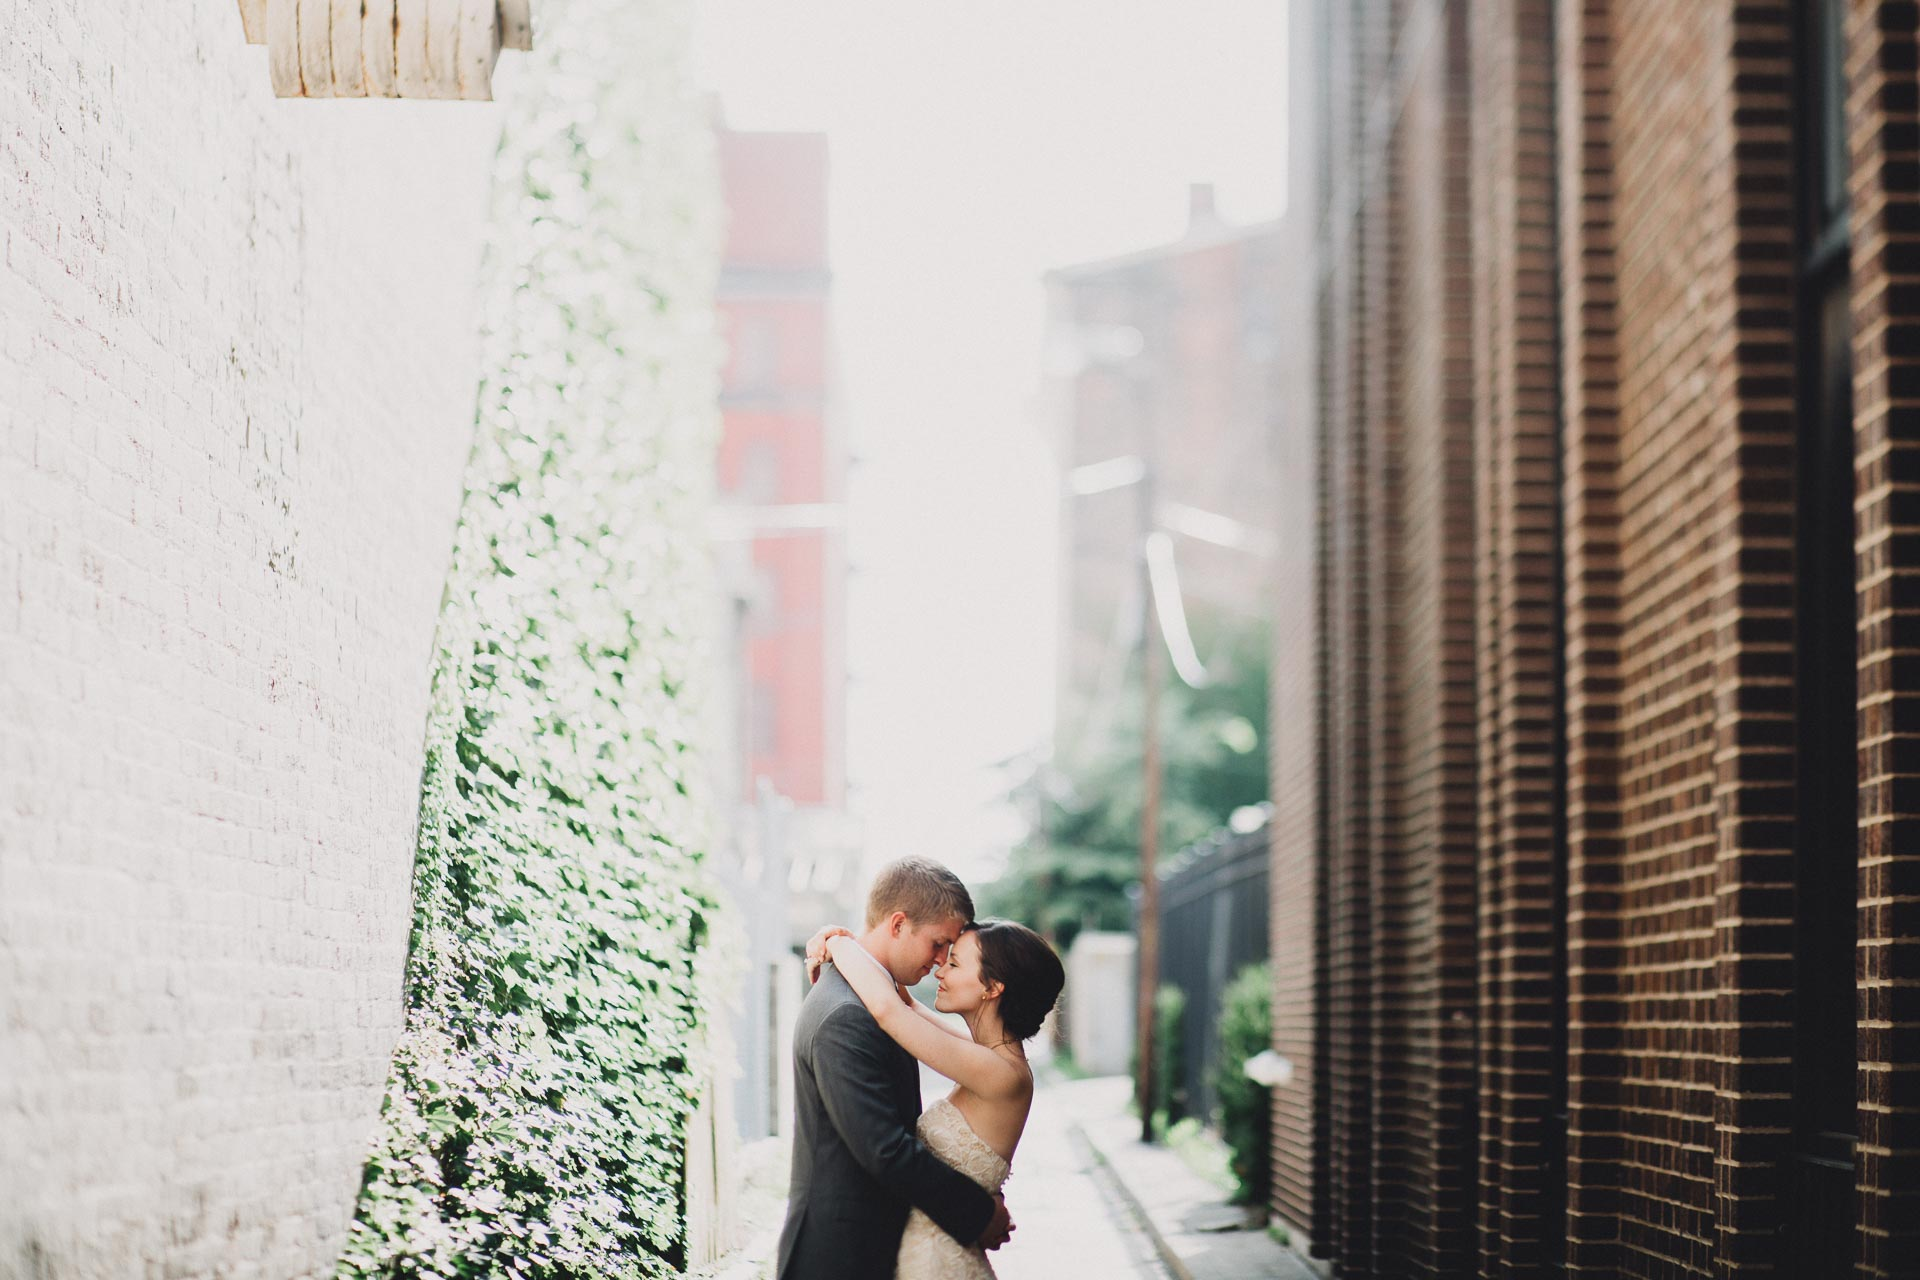 Julia-Michael-Cincinnati-Music-Hall-Wedding-114@2x.jpg